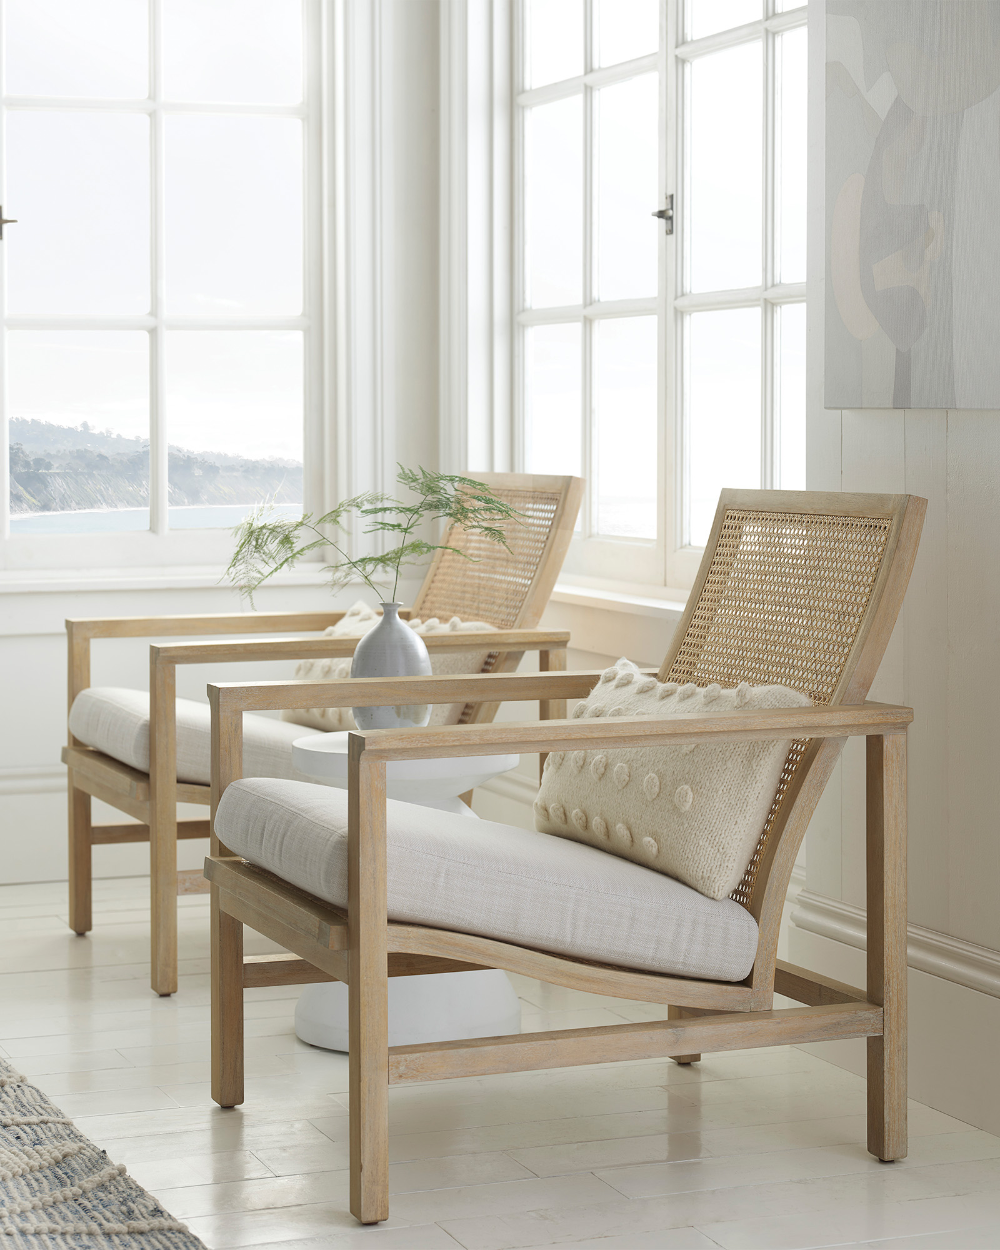 Georgica Lounge Chair Serena Lily Modern Lounge Chair Design Lounge Chair Design Rattan Lounge Chair [ 1250 x 1000 Pixel ]